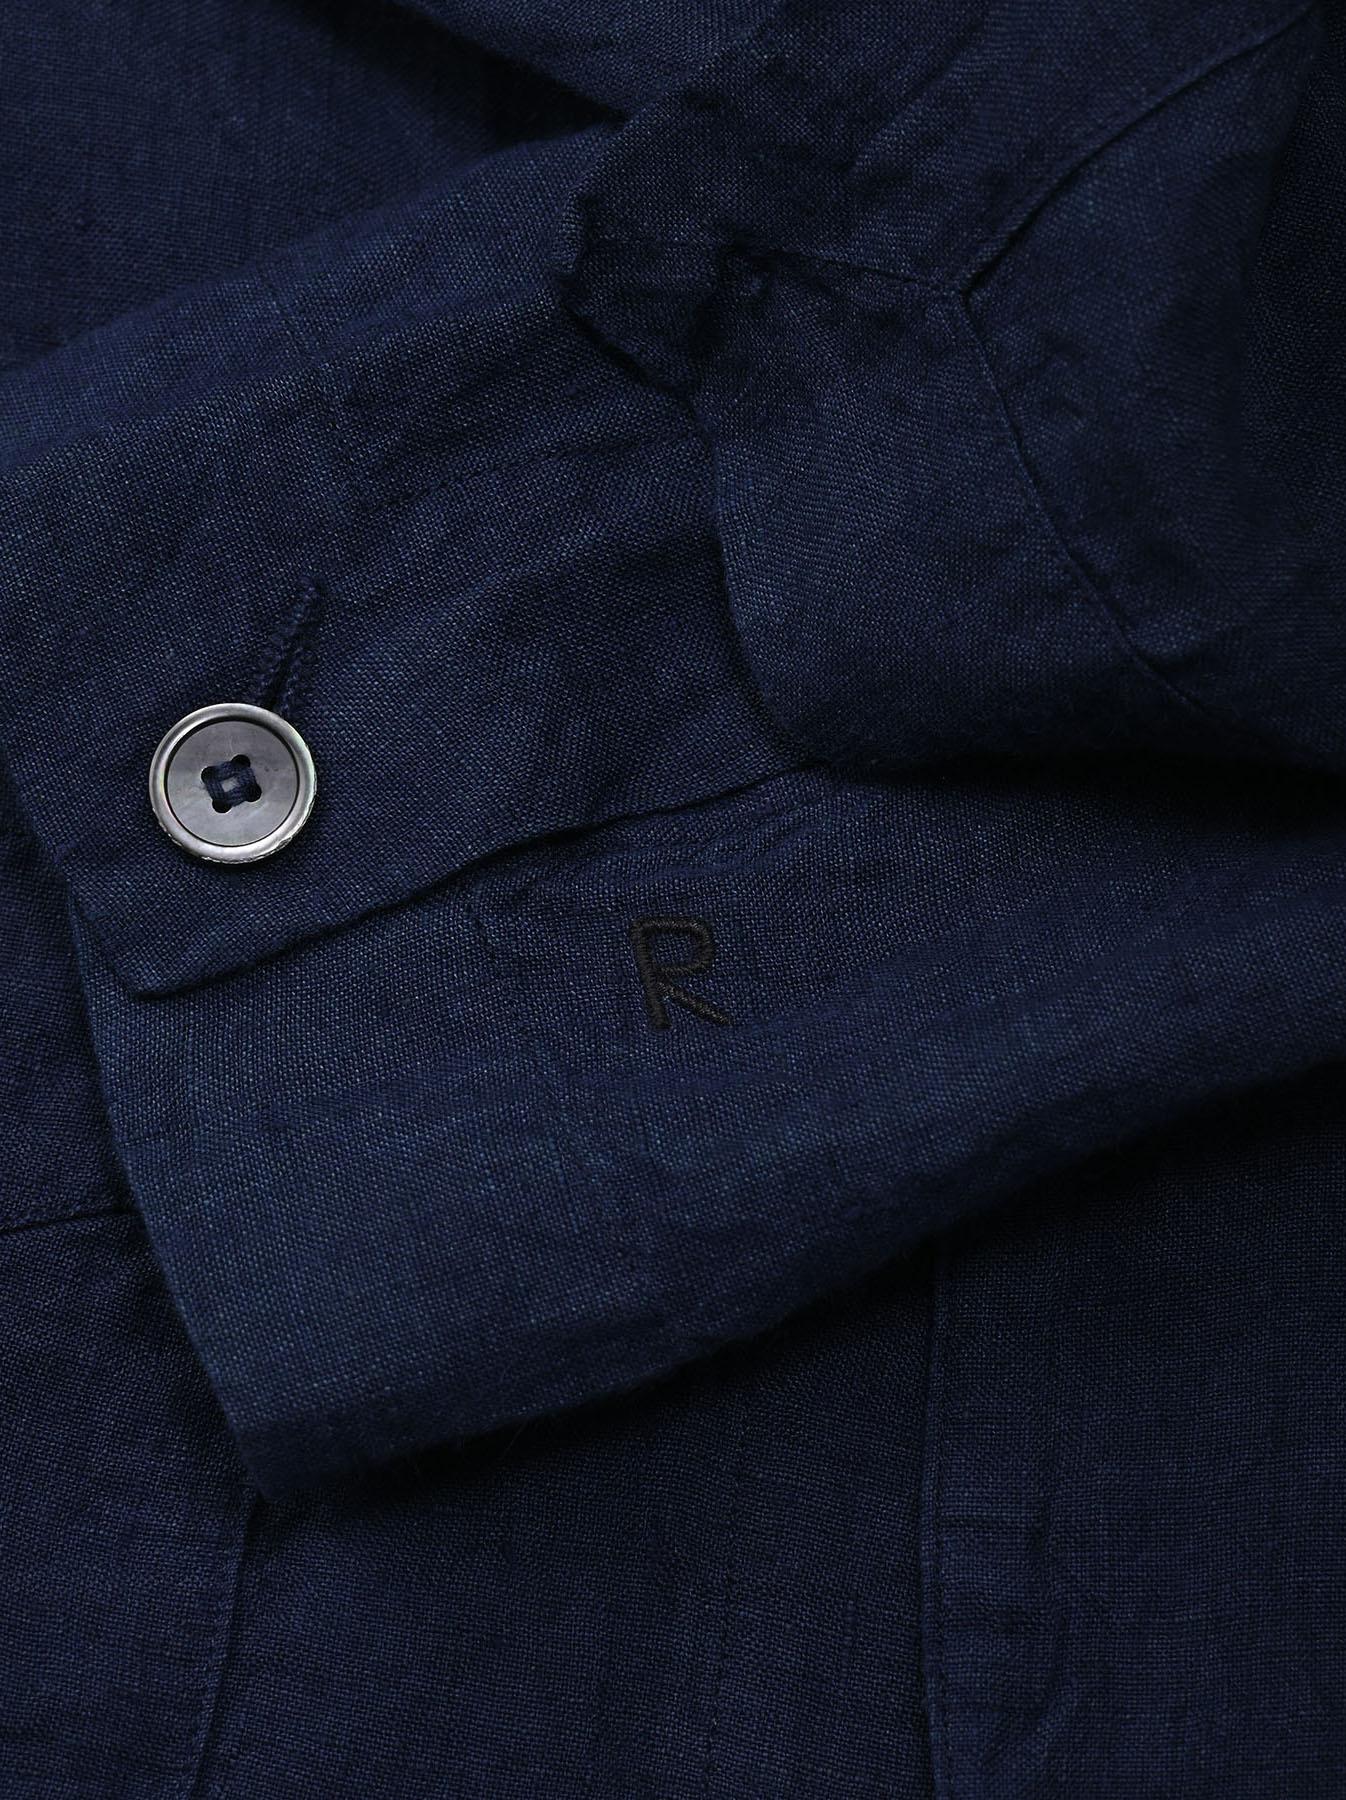 Indigo Indian Linen Flat Shirt Jacket (0521)-10